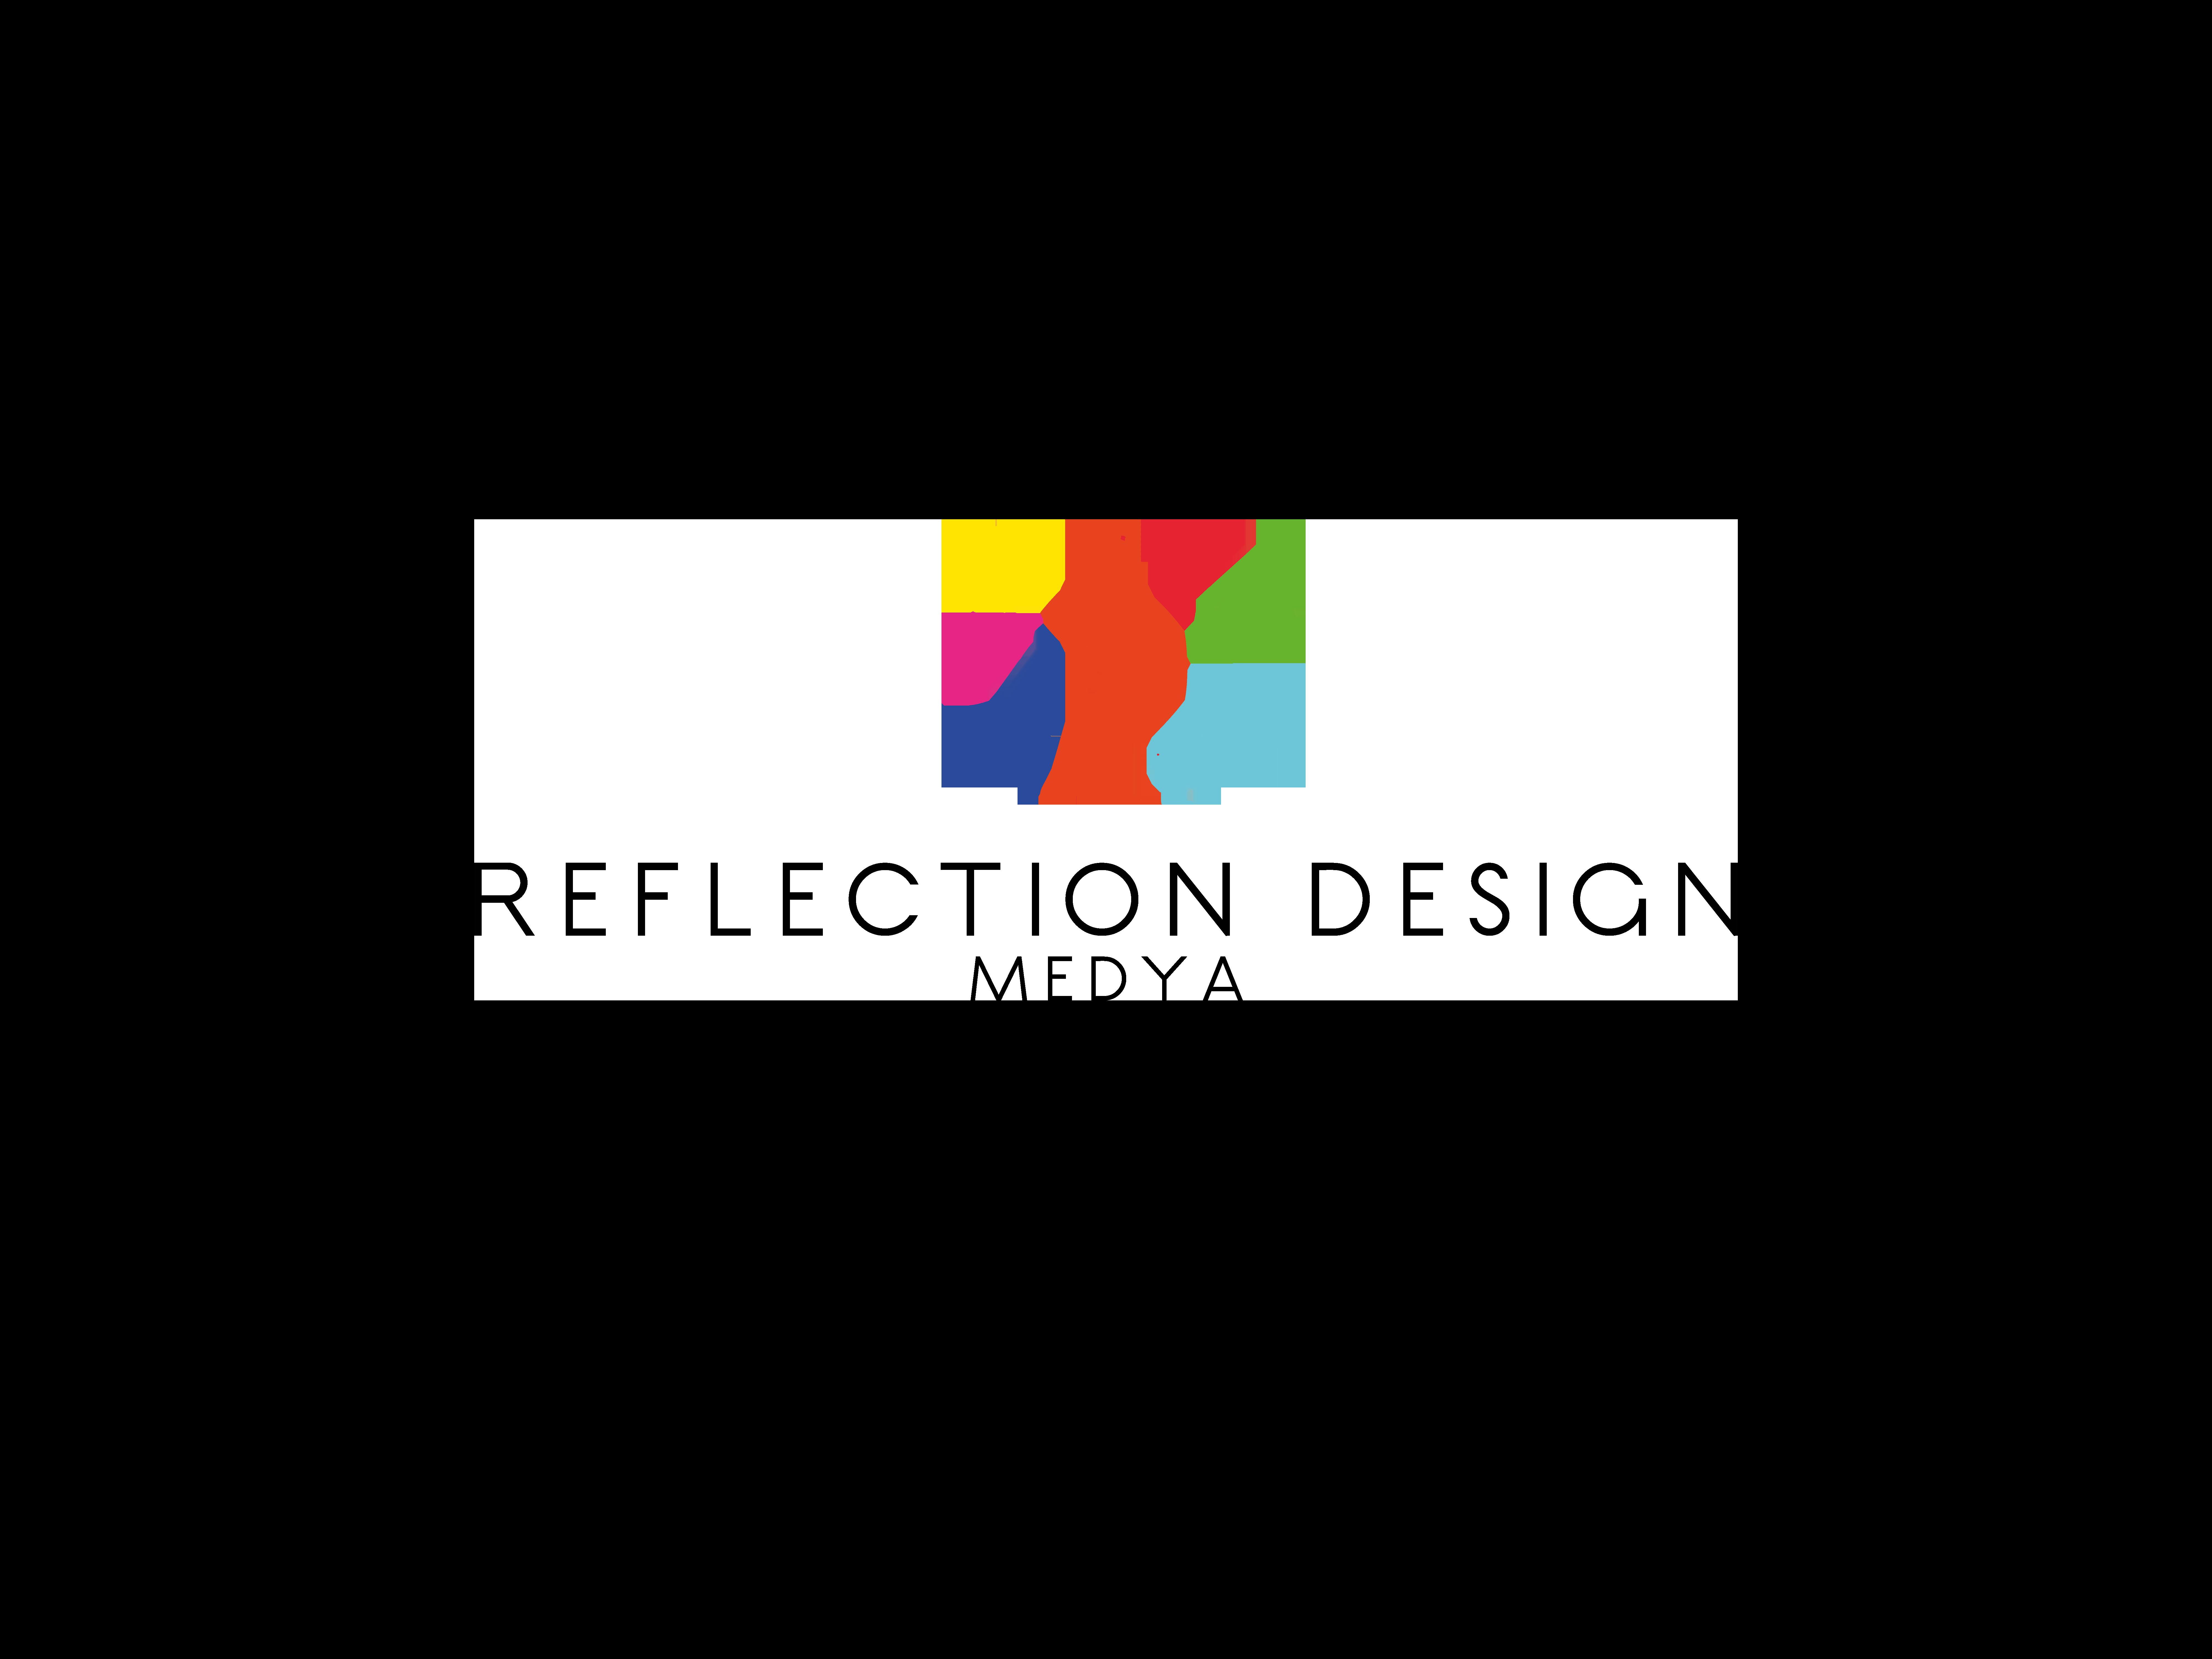 https://rdmedya.com/wp-content/uploads/2019/12/Logo-Dikey-Renkli.png